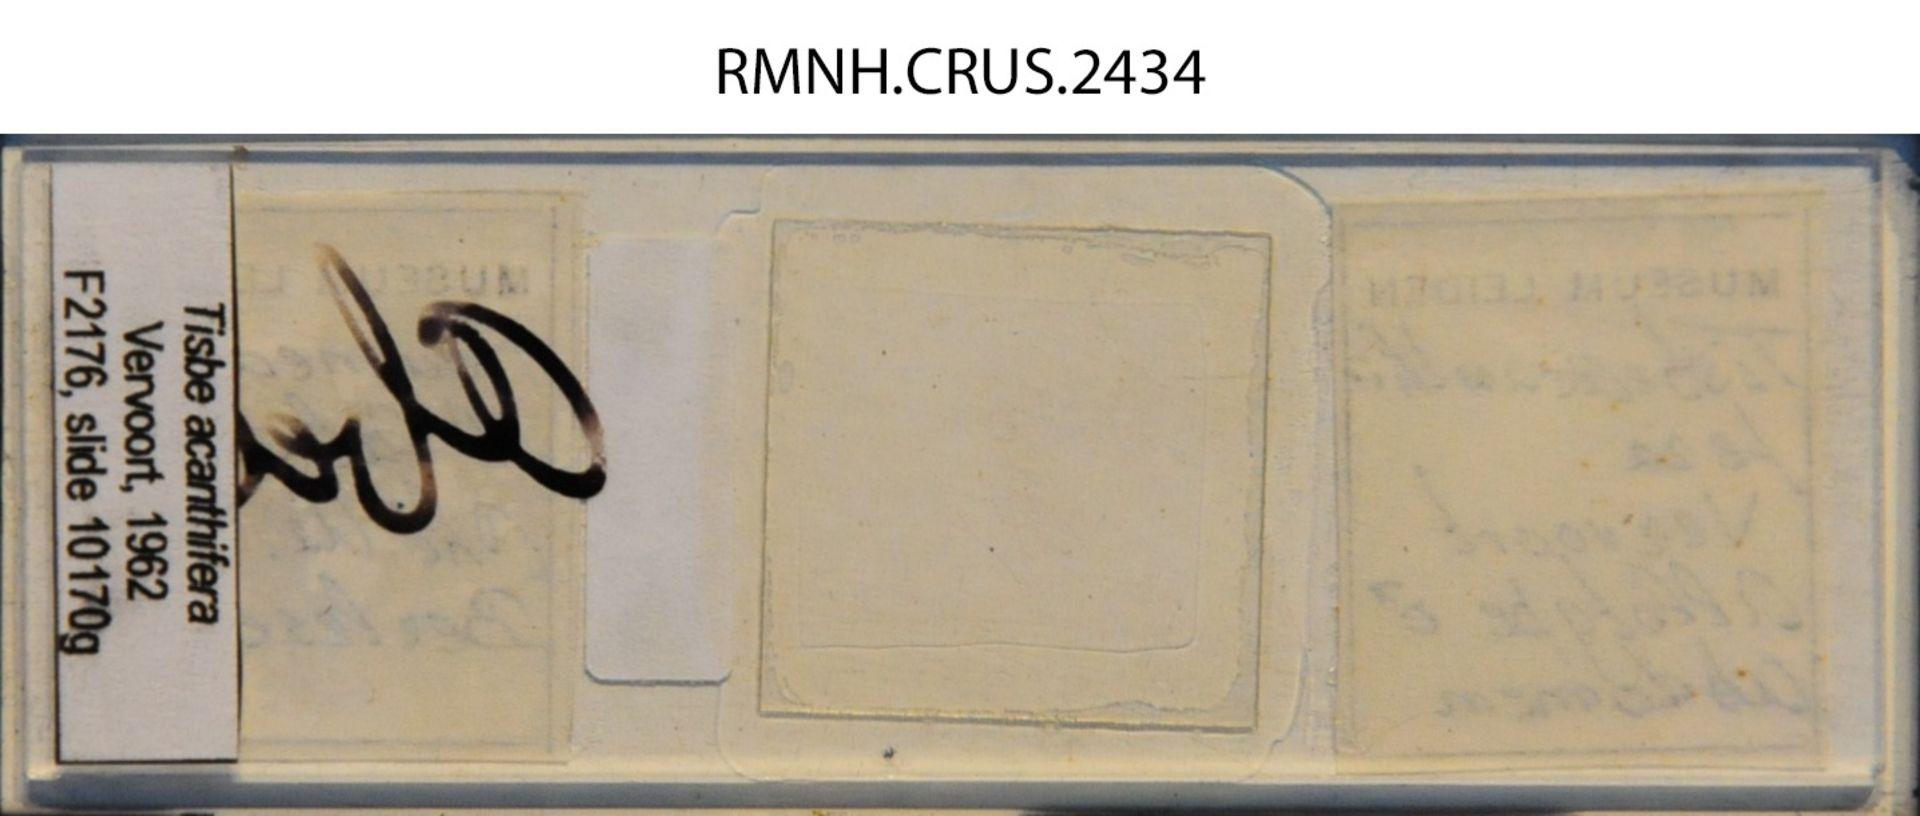 RMNH.CRUS.2434 | Tisbe acanthifera Vervoort, 1962